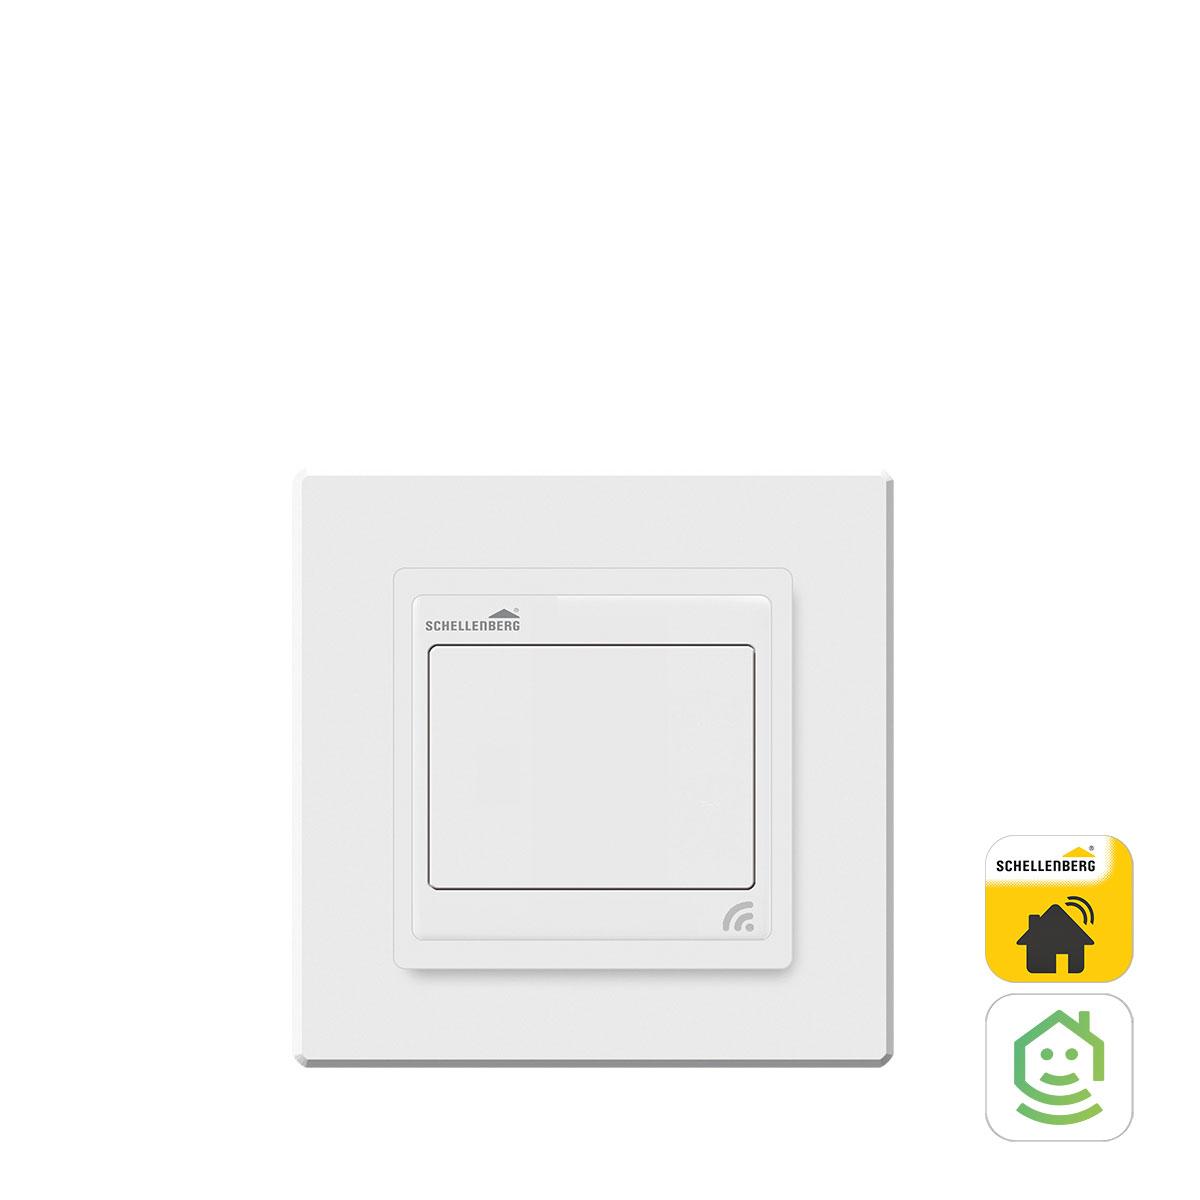 Licht | Energiesparen & Beleuchtung | Smart Home | Produkte